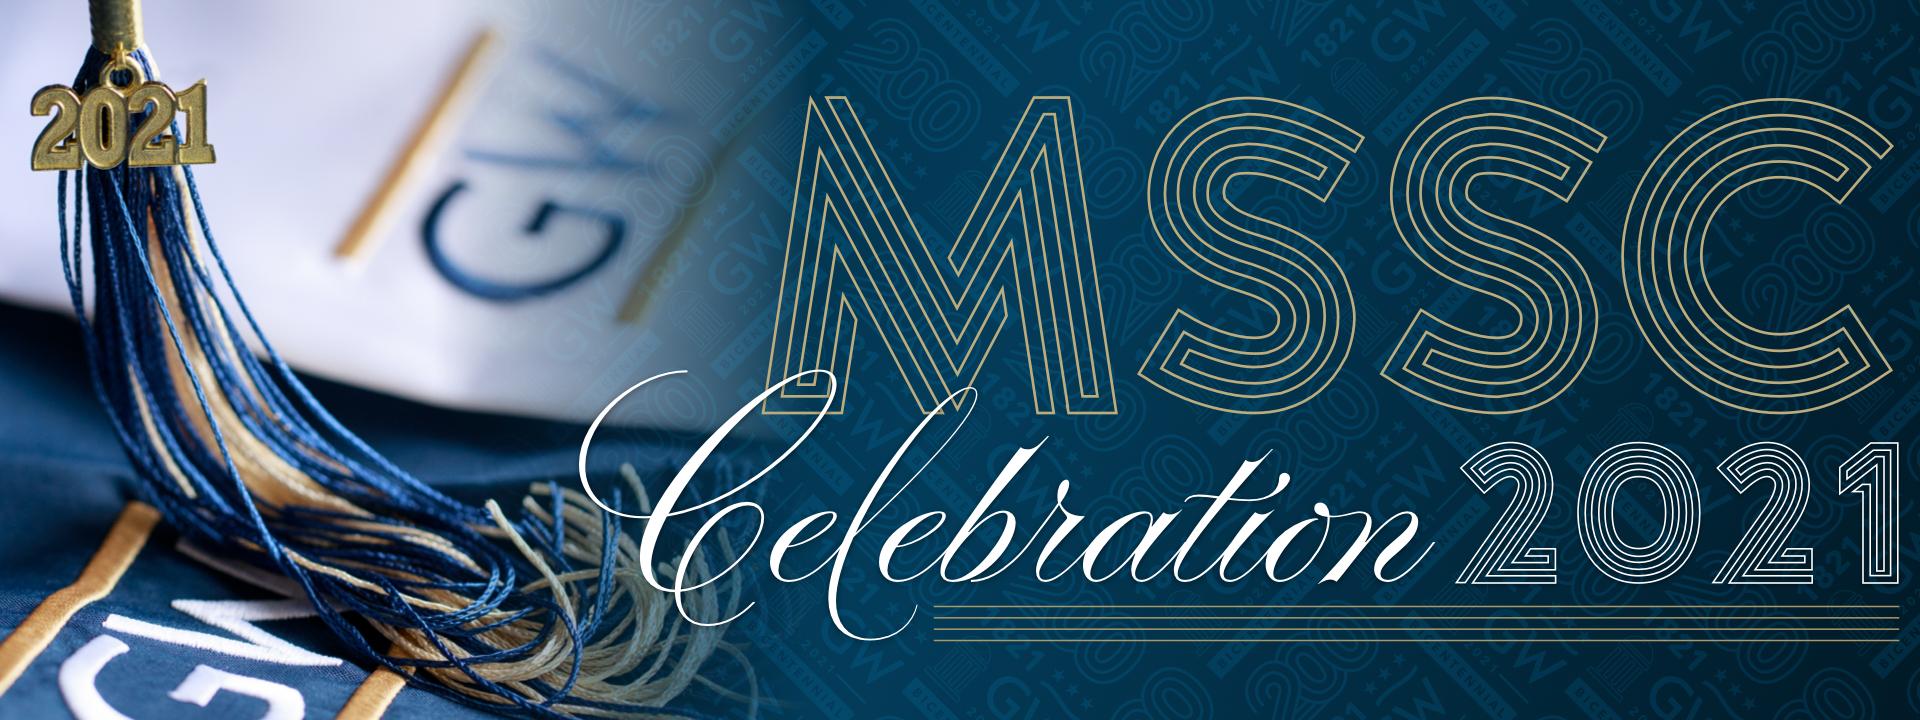 MSSC Graduation Celebration 2021